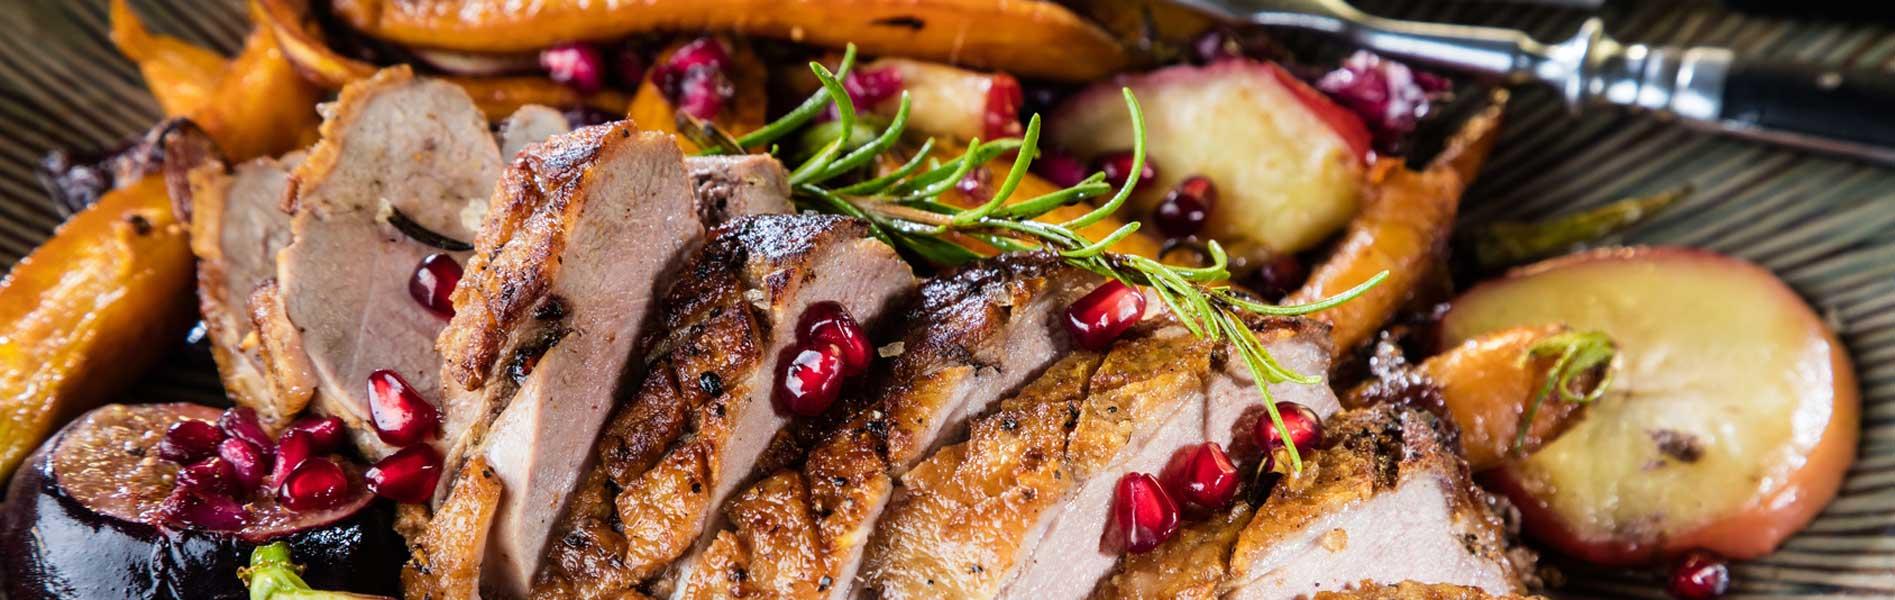 Unikorn Catering_Saisonales_Weihnachtscatering München